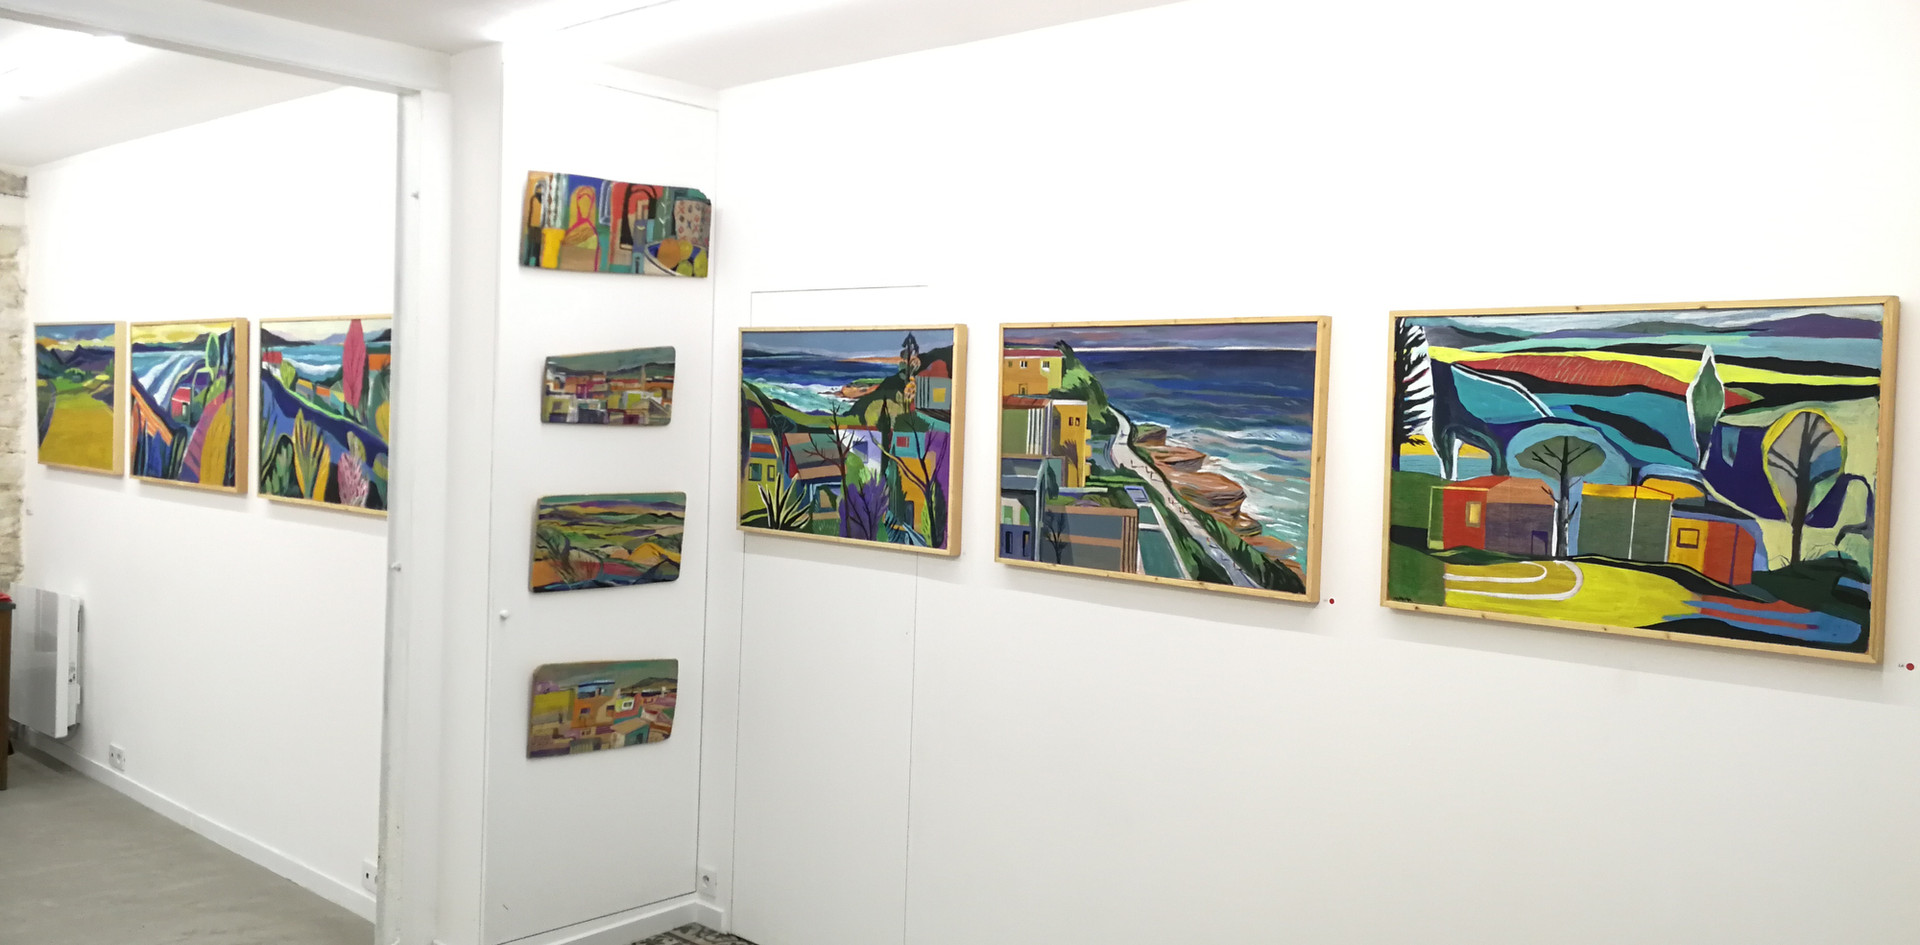 Exposition Visage Paysage, Laurent Corvaisier